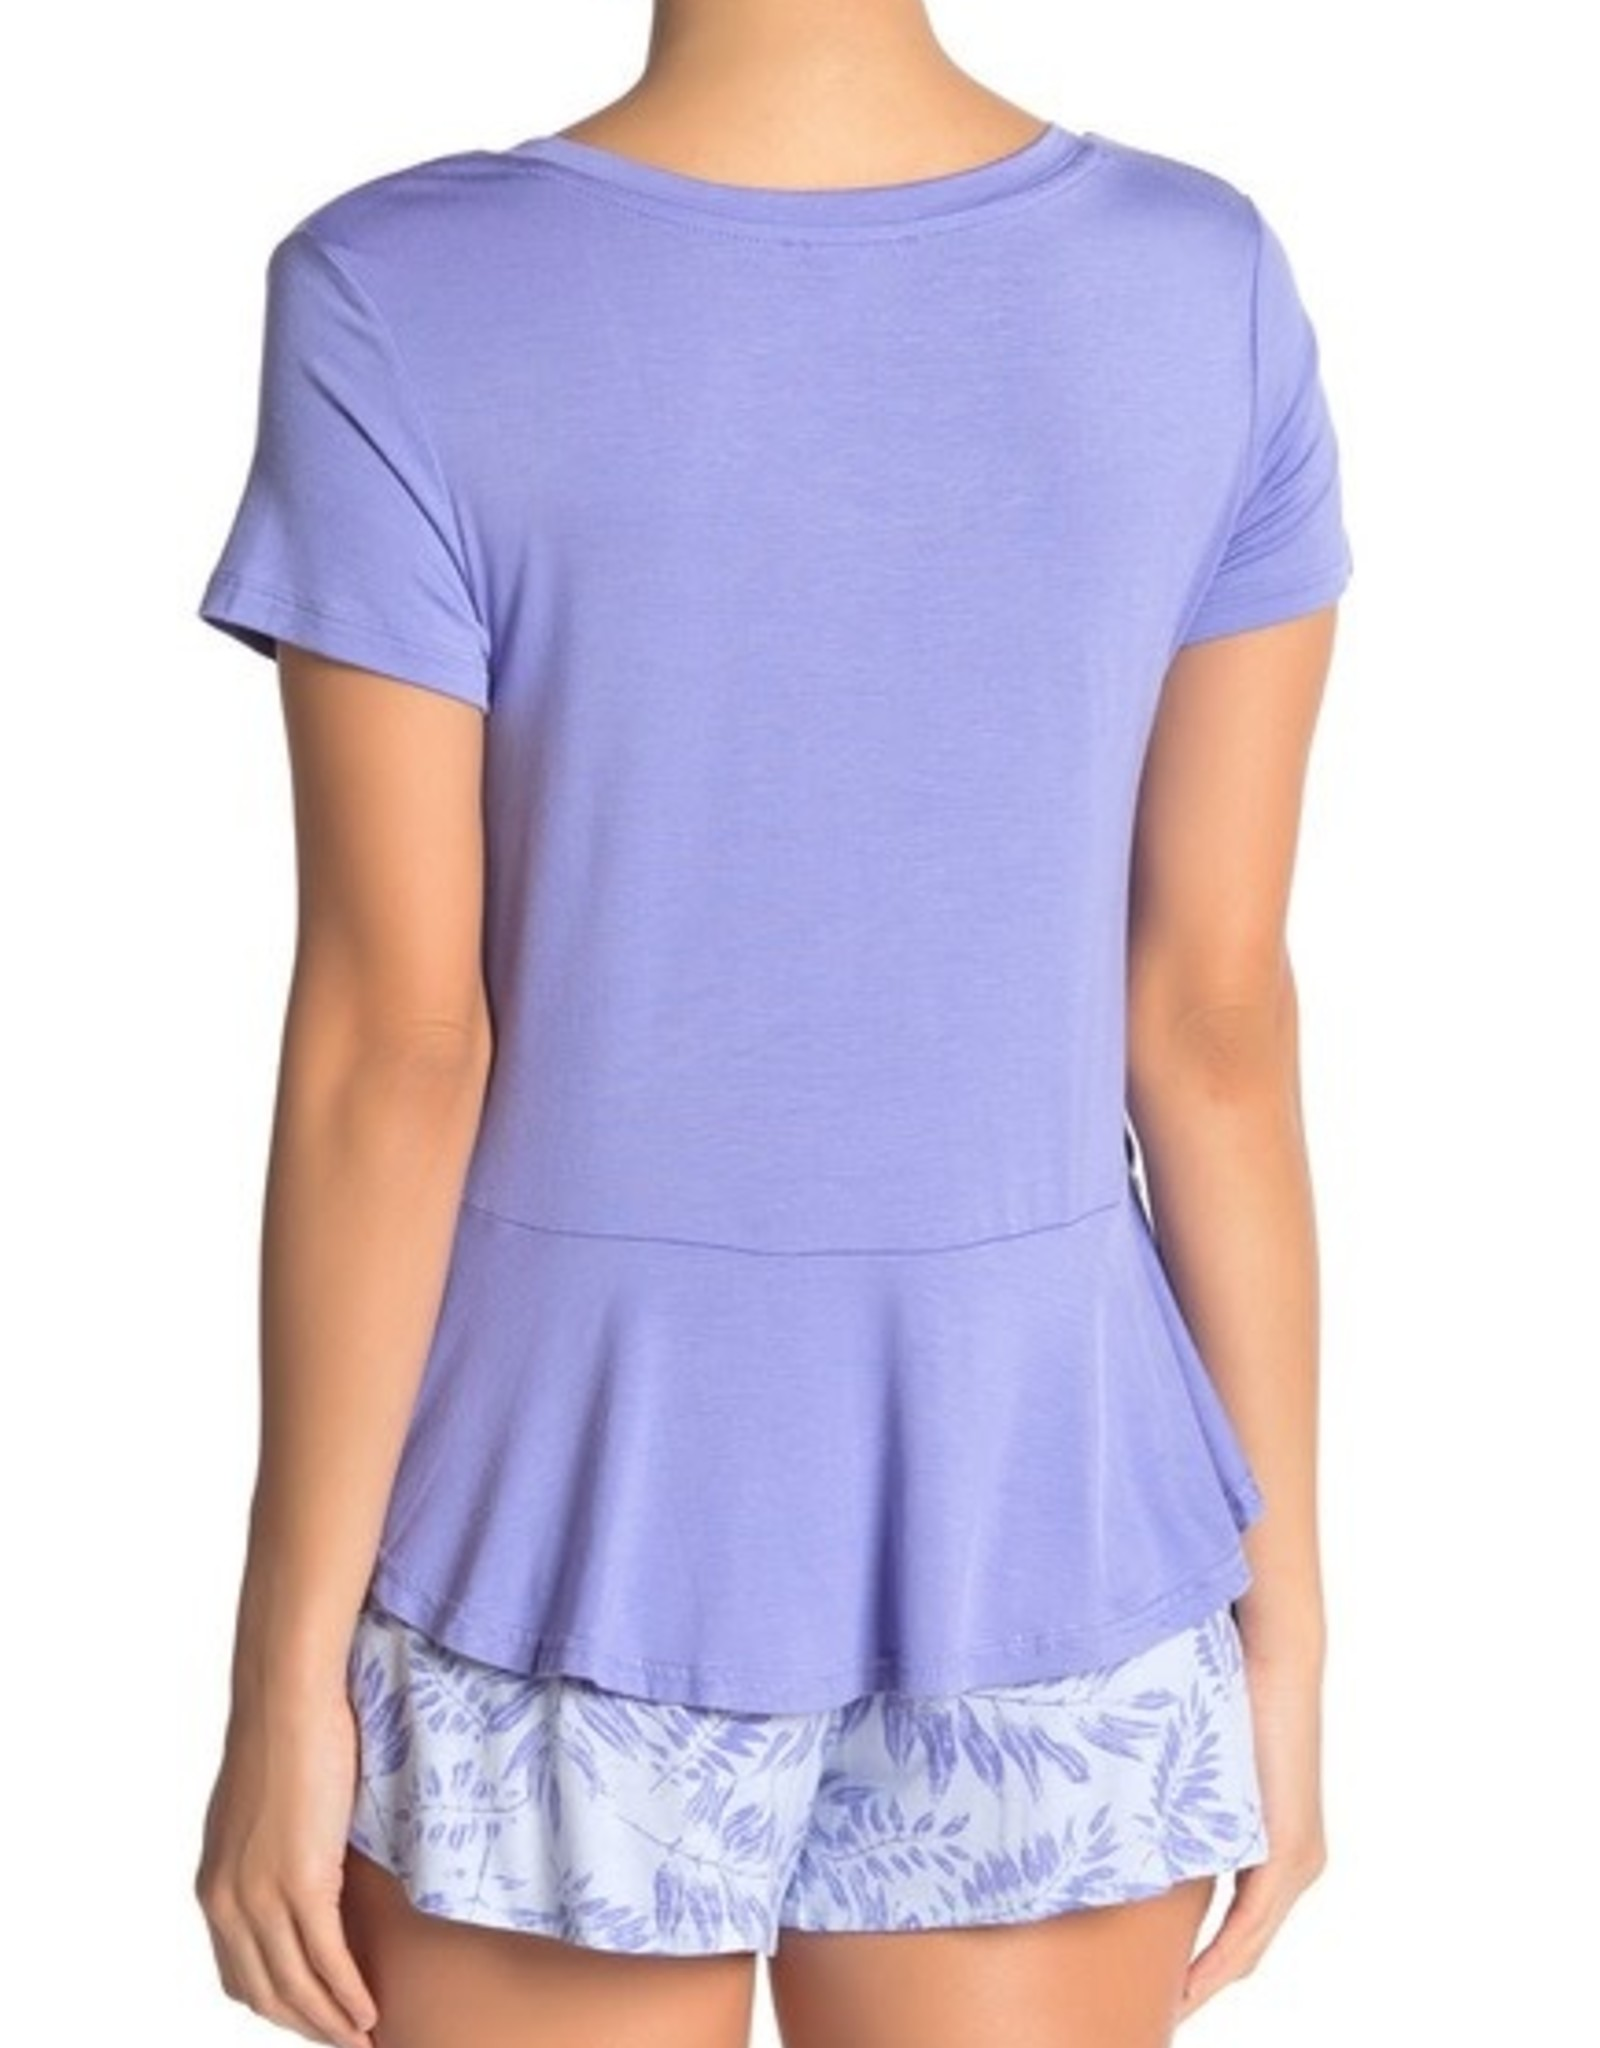 halebob Hale Bob Ruffled Hem Pajama Top Size XL #439E